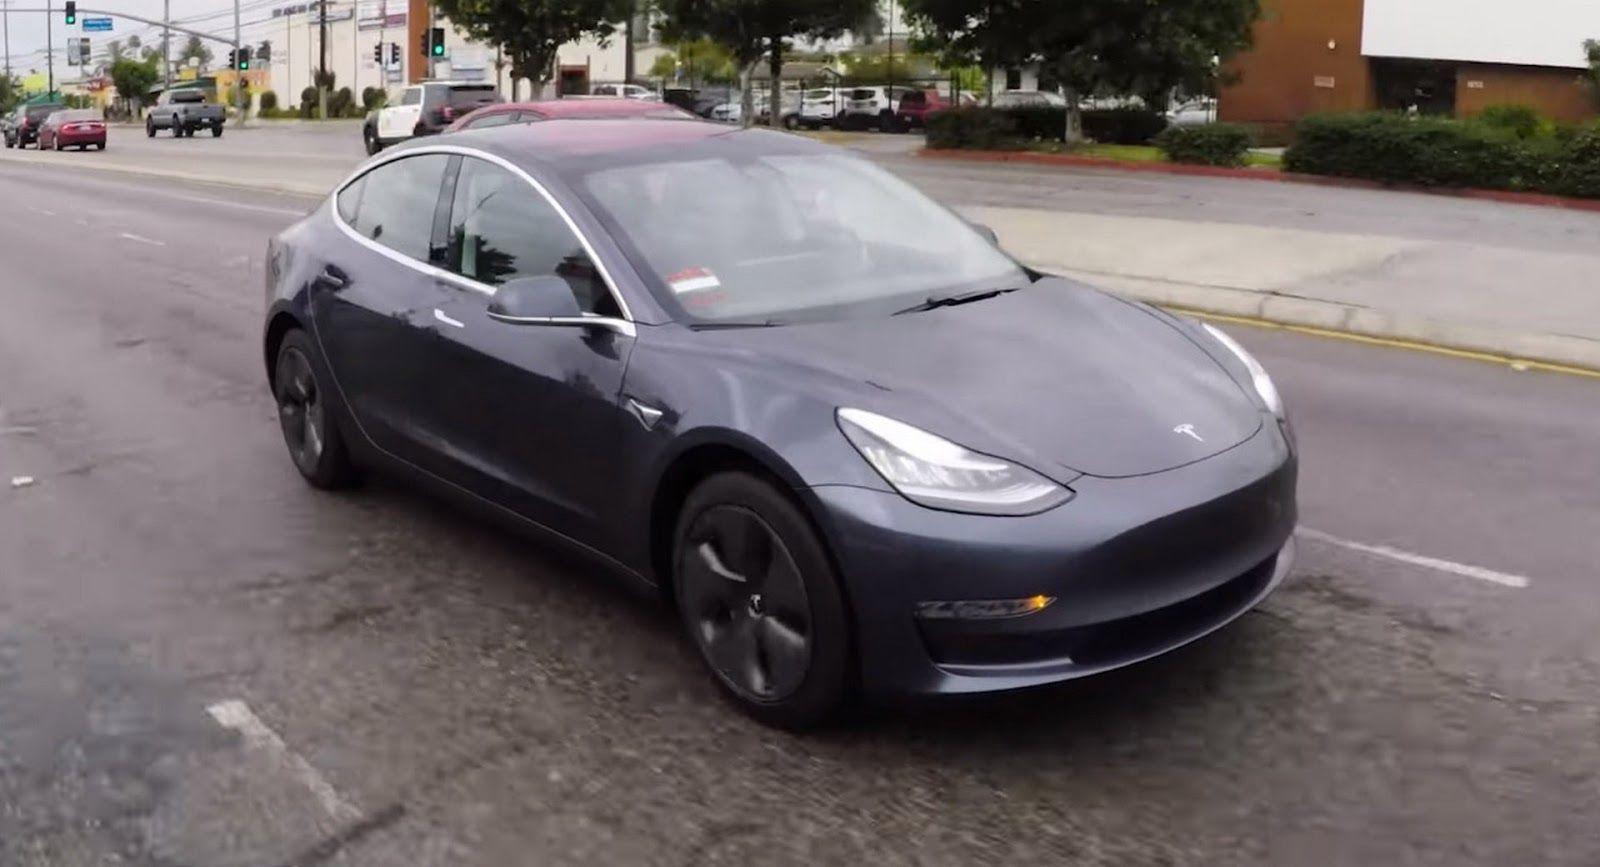 Edmunds S Its Own Tesla Model 3 Delivers First Impressions